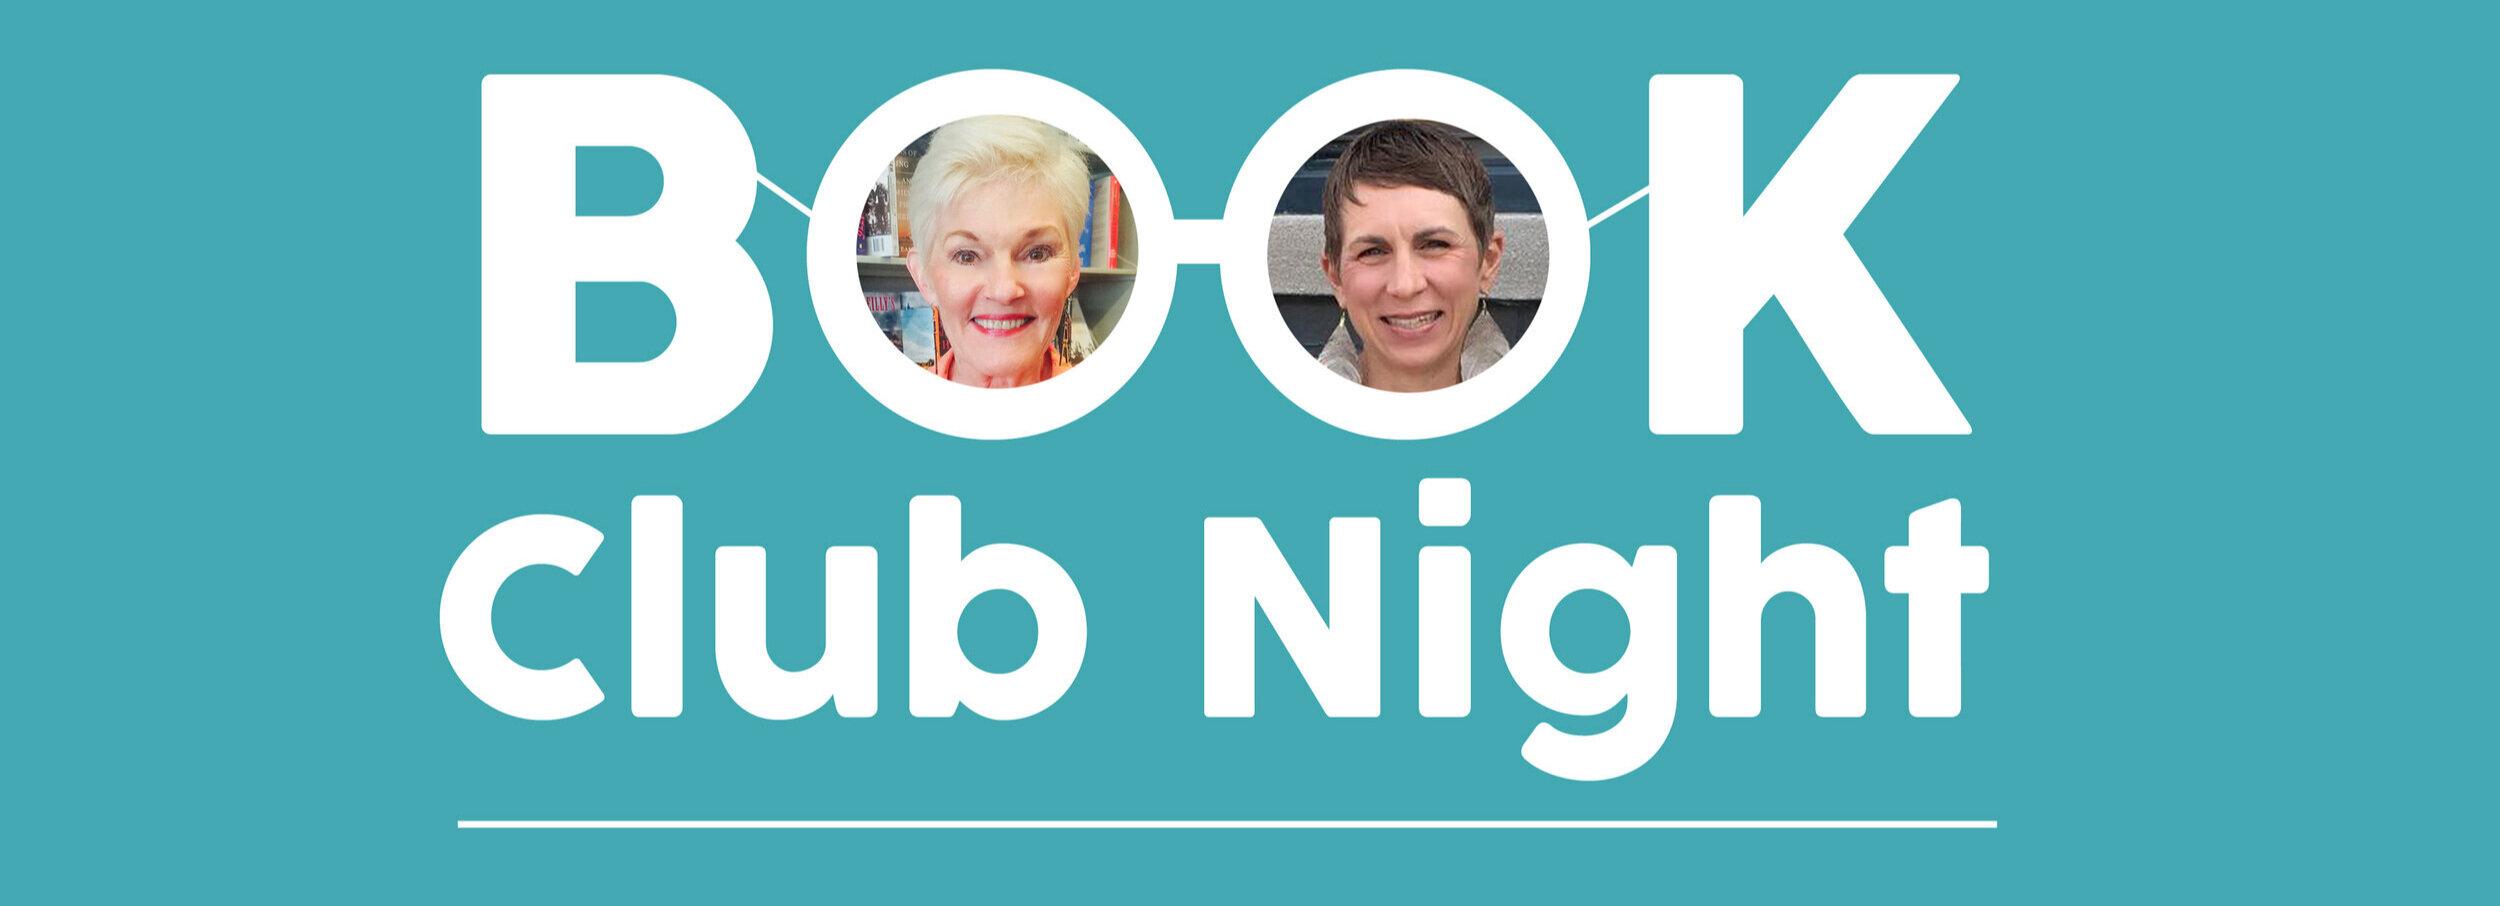 book+club+night+steph.jpg